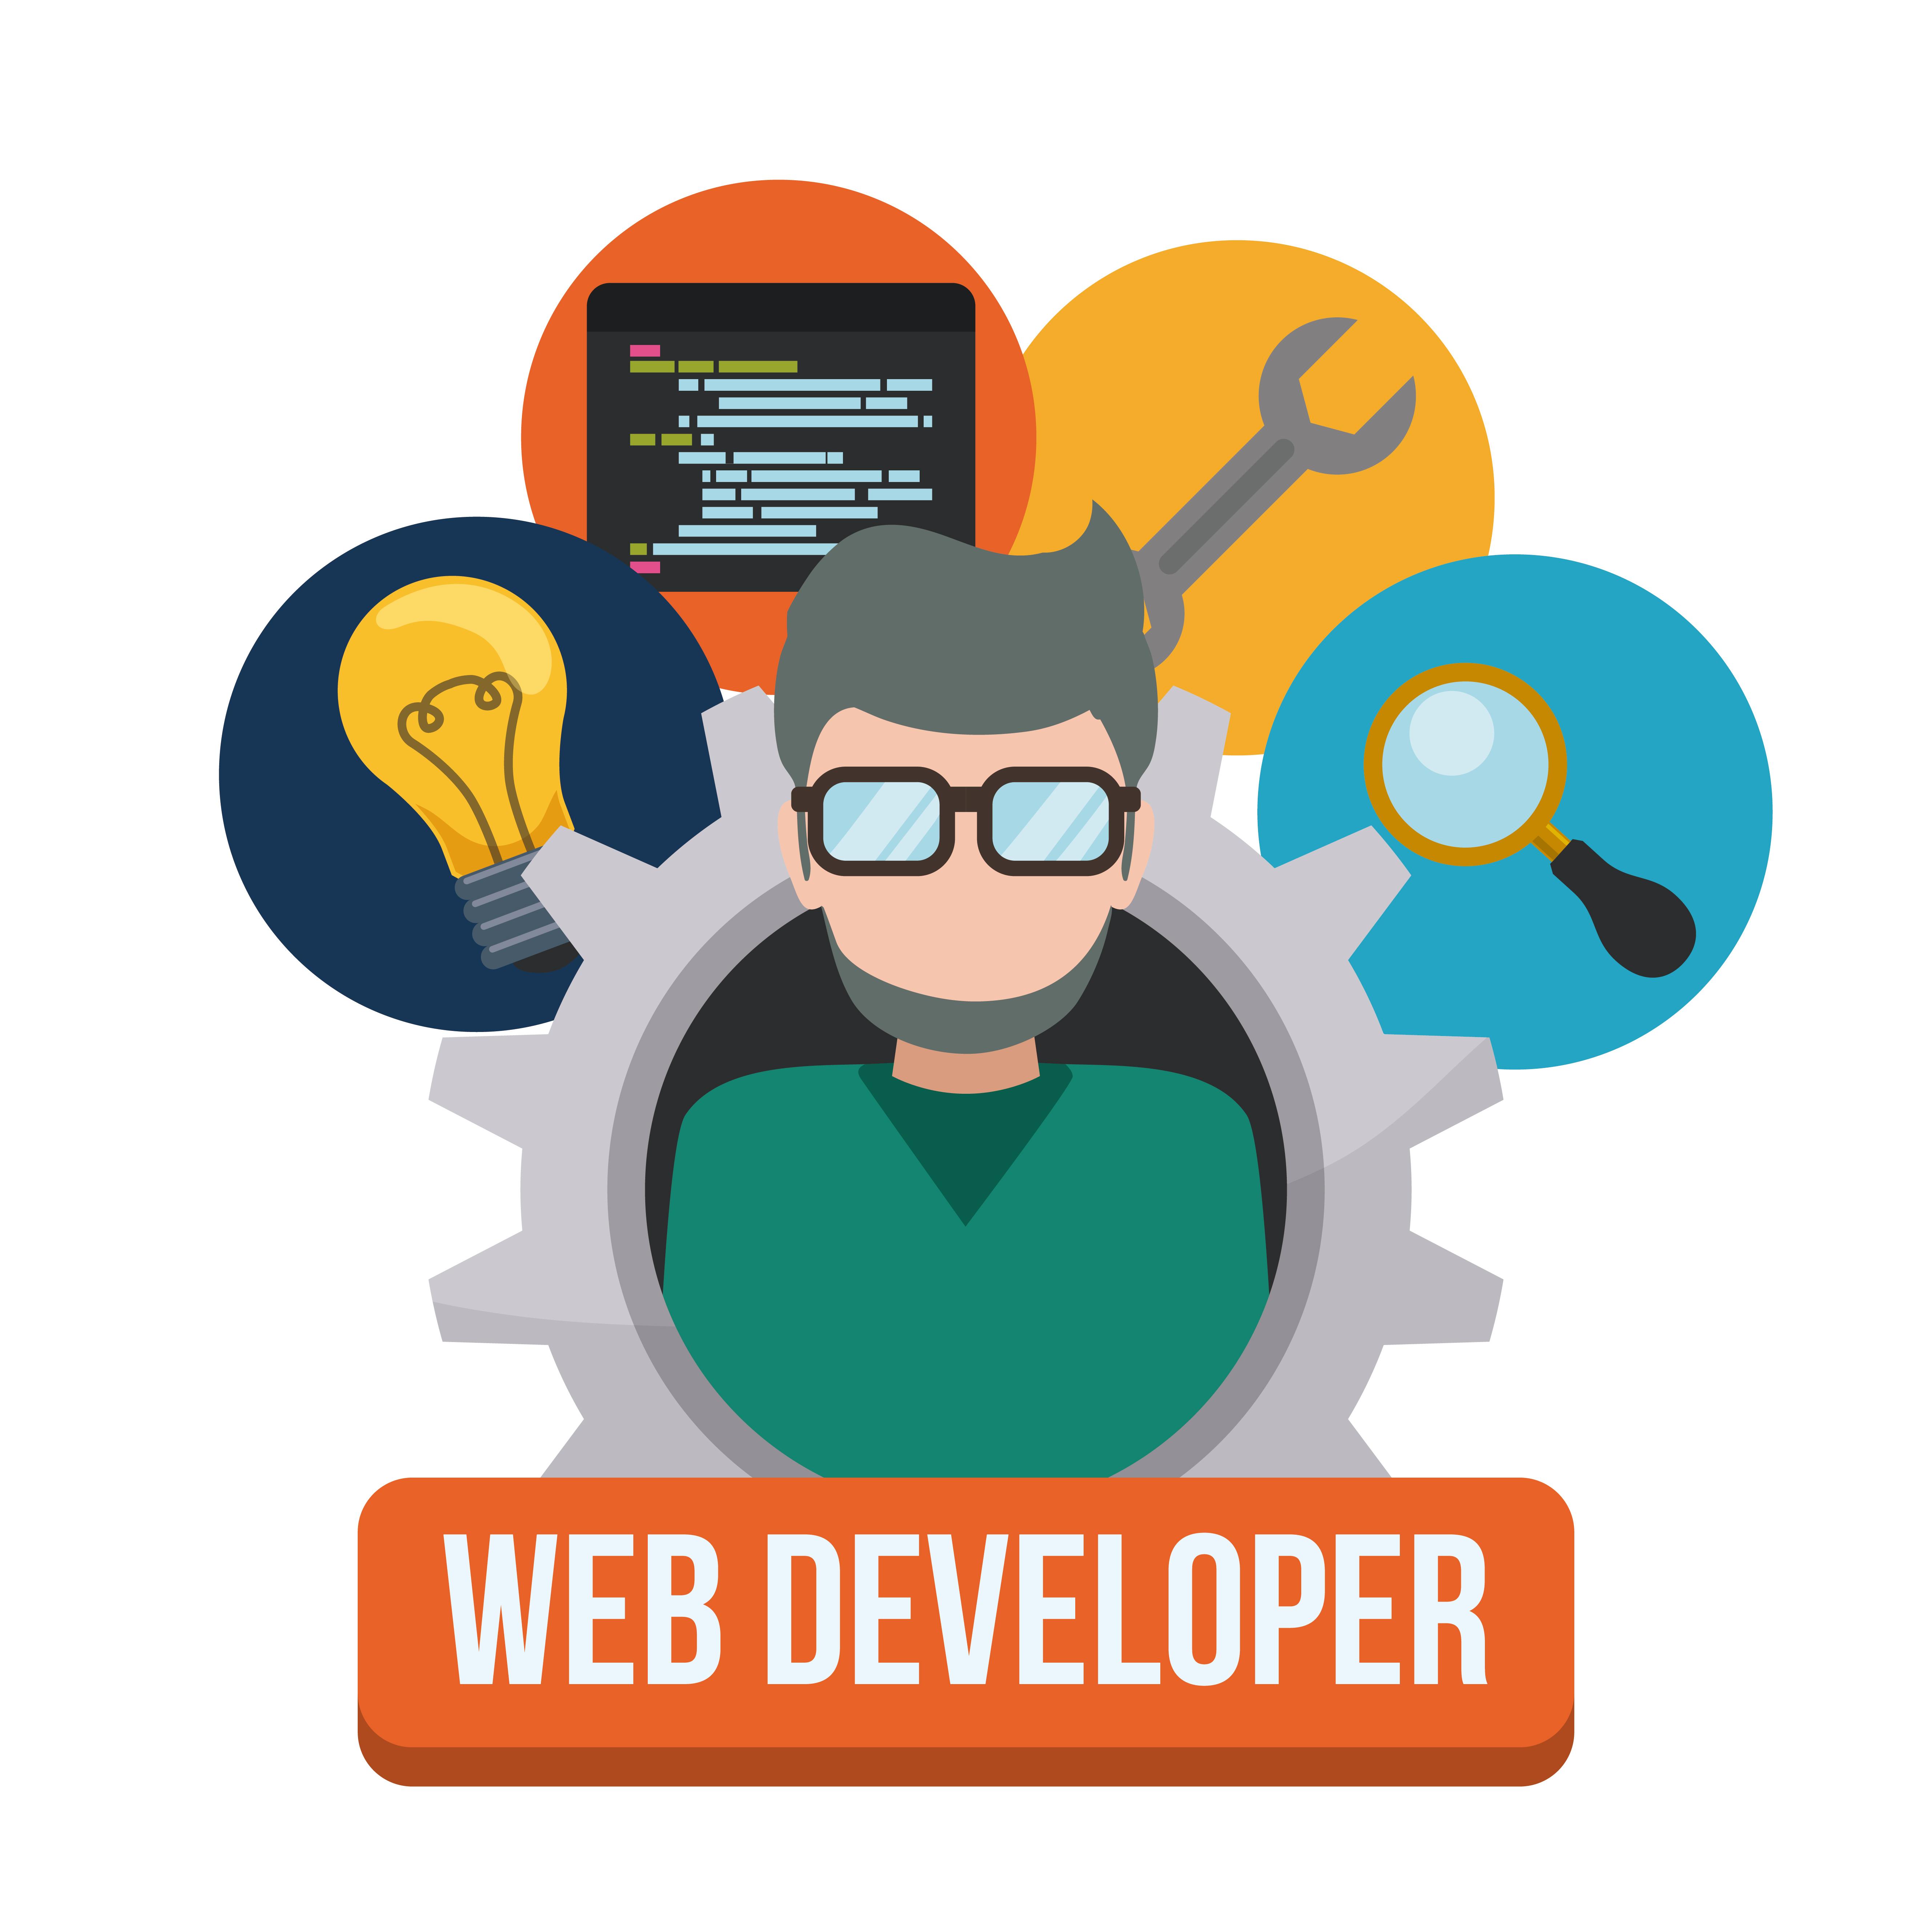 Web developer logo clipart jpg transparent stock 4 Questions You Must Ask Your Web Developer | Axis Software ... jpg transparent stock